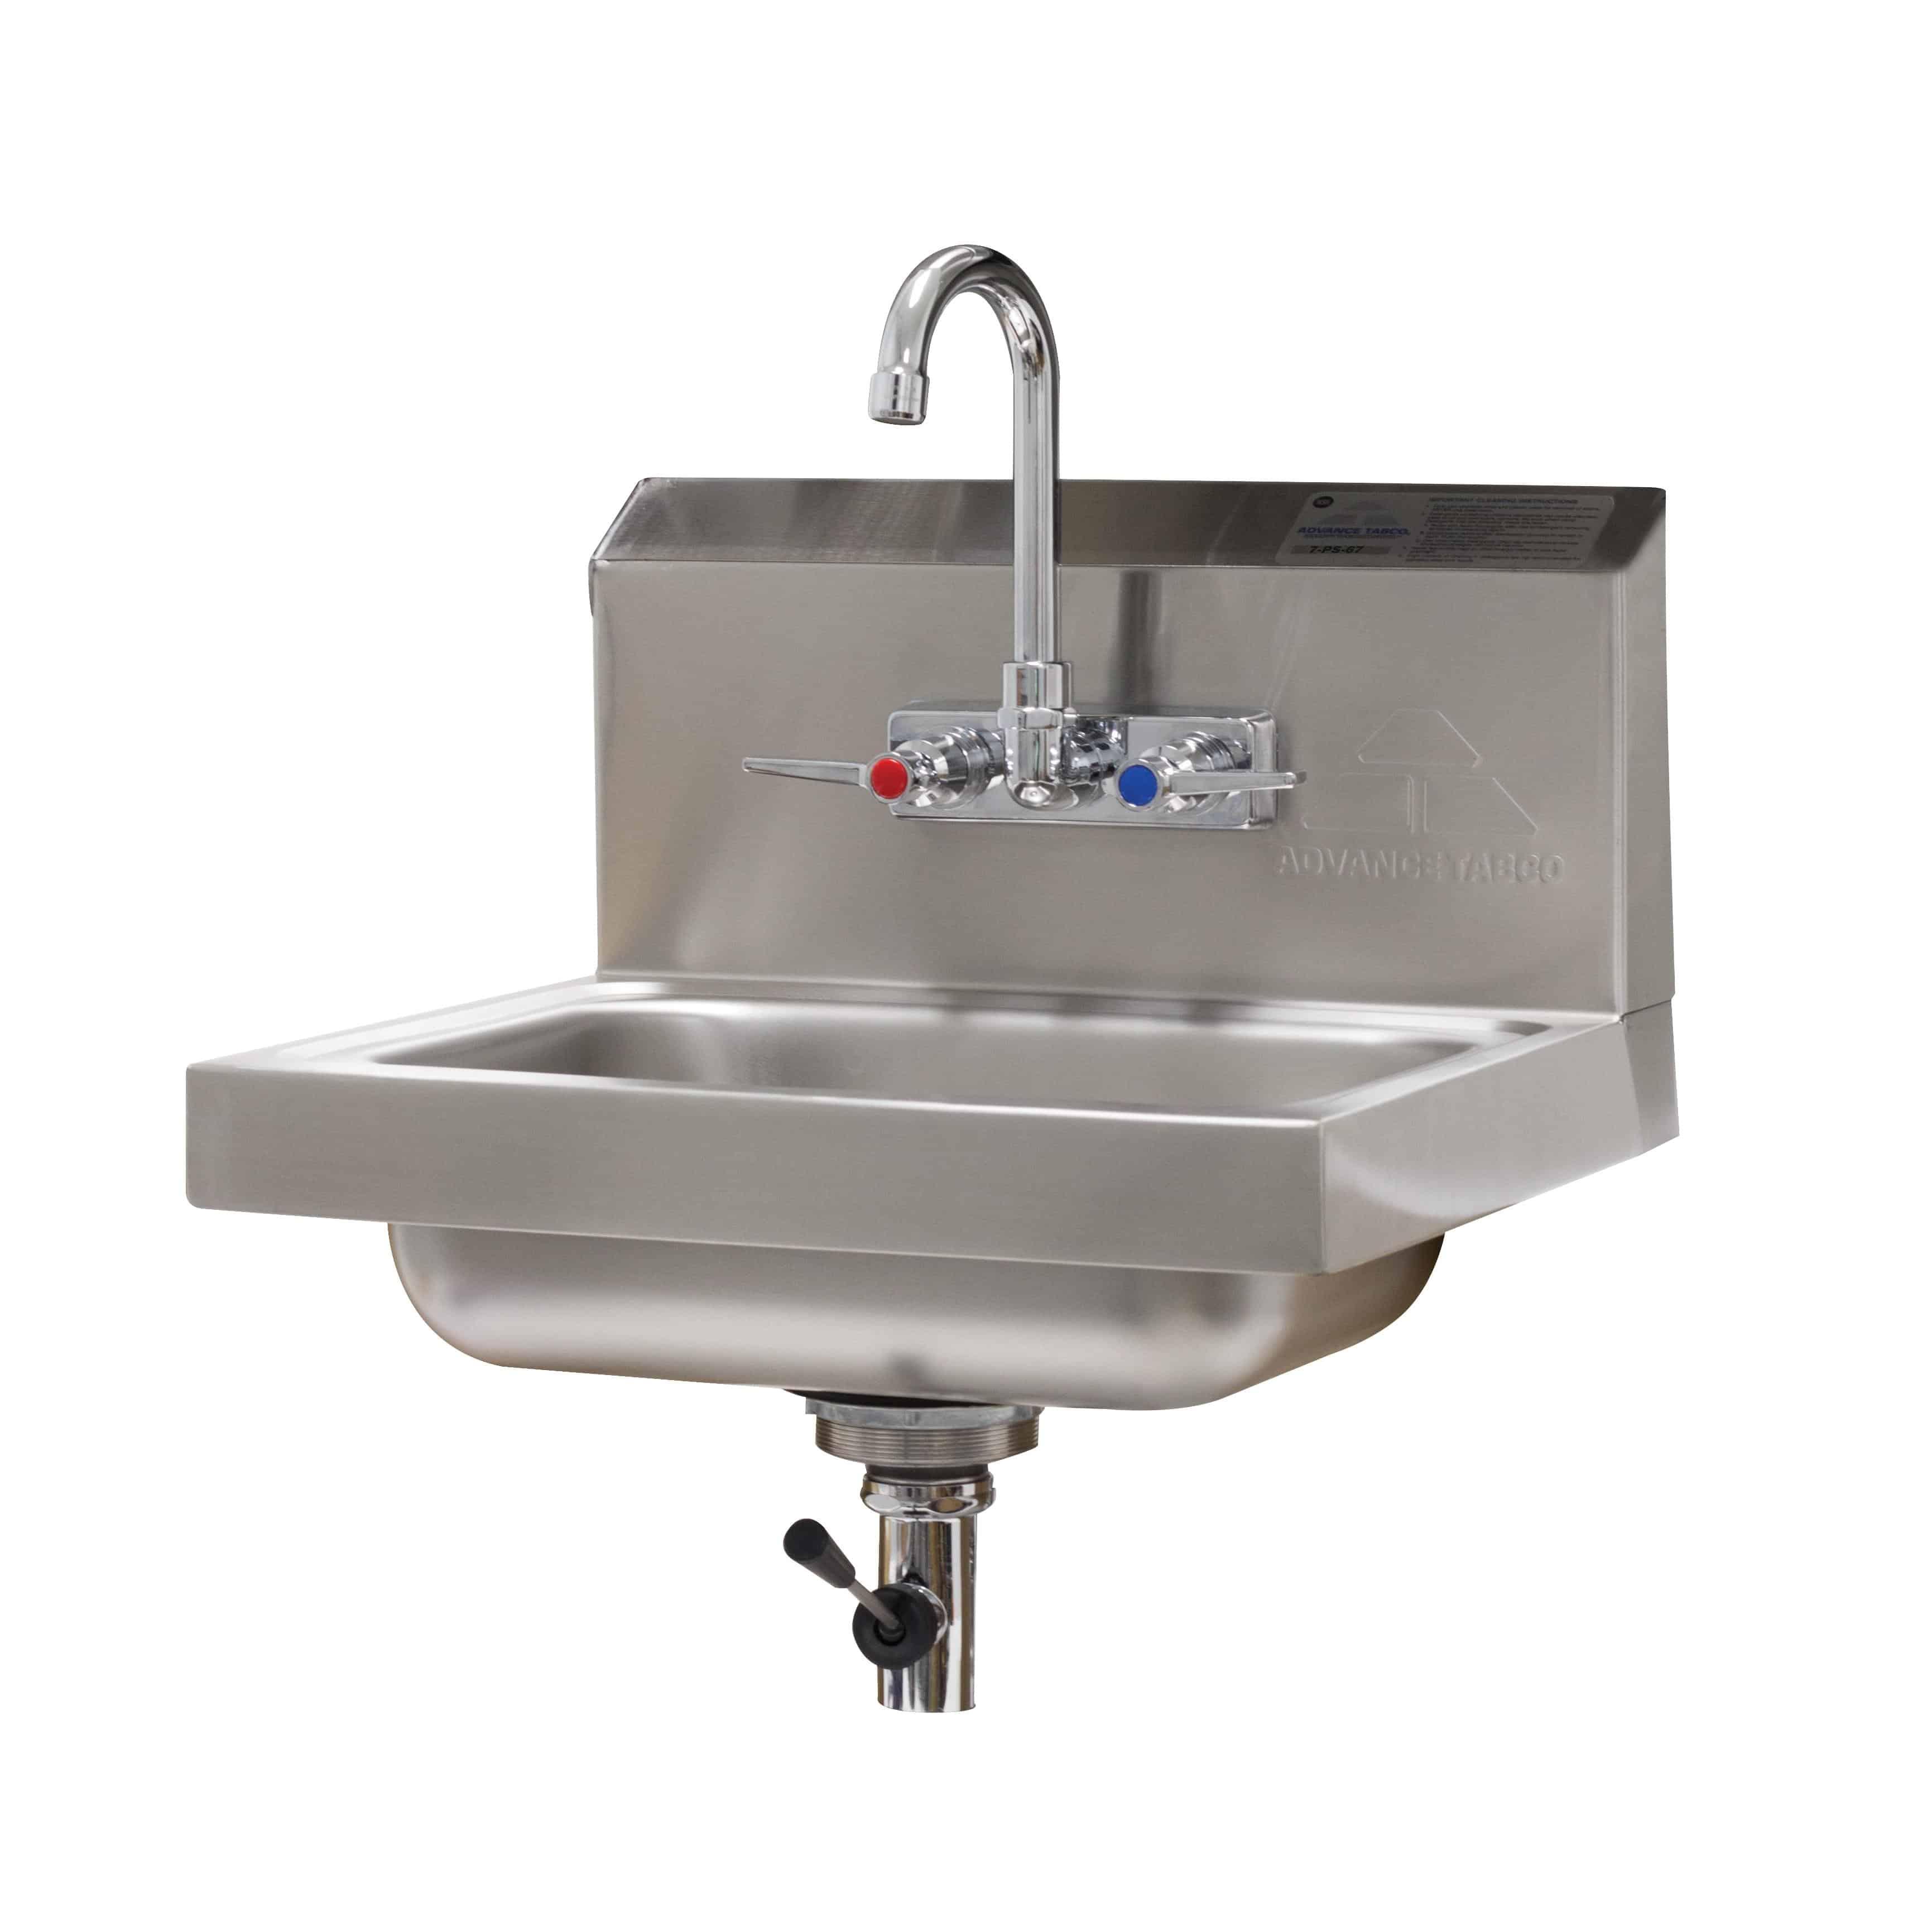 Advance Tabco 7-PS-67 Hand Sink | Kitchen Equipment | CKitchen.com